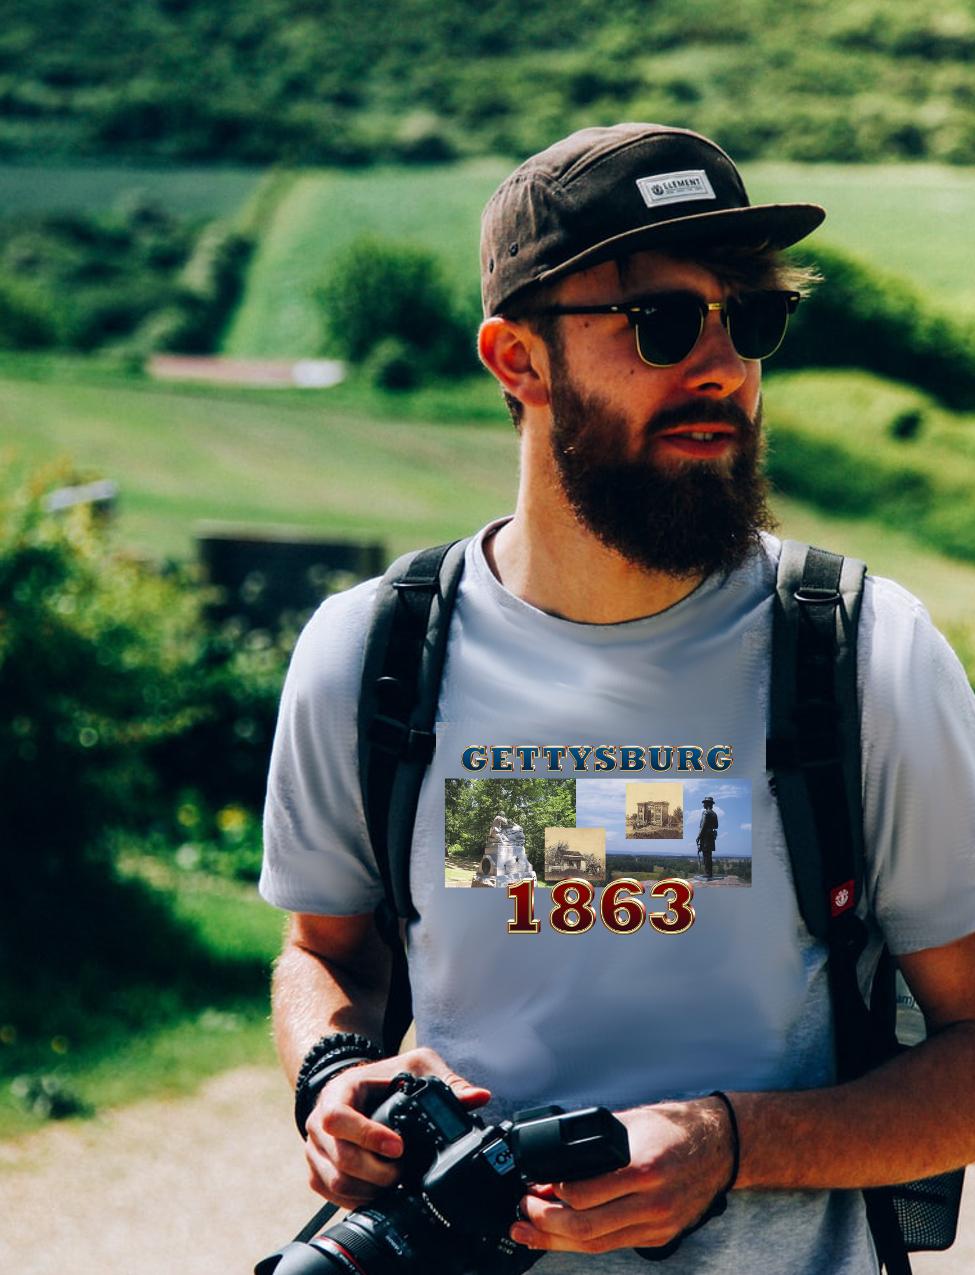 Gettysburg Souvenirs